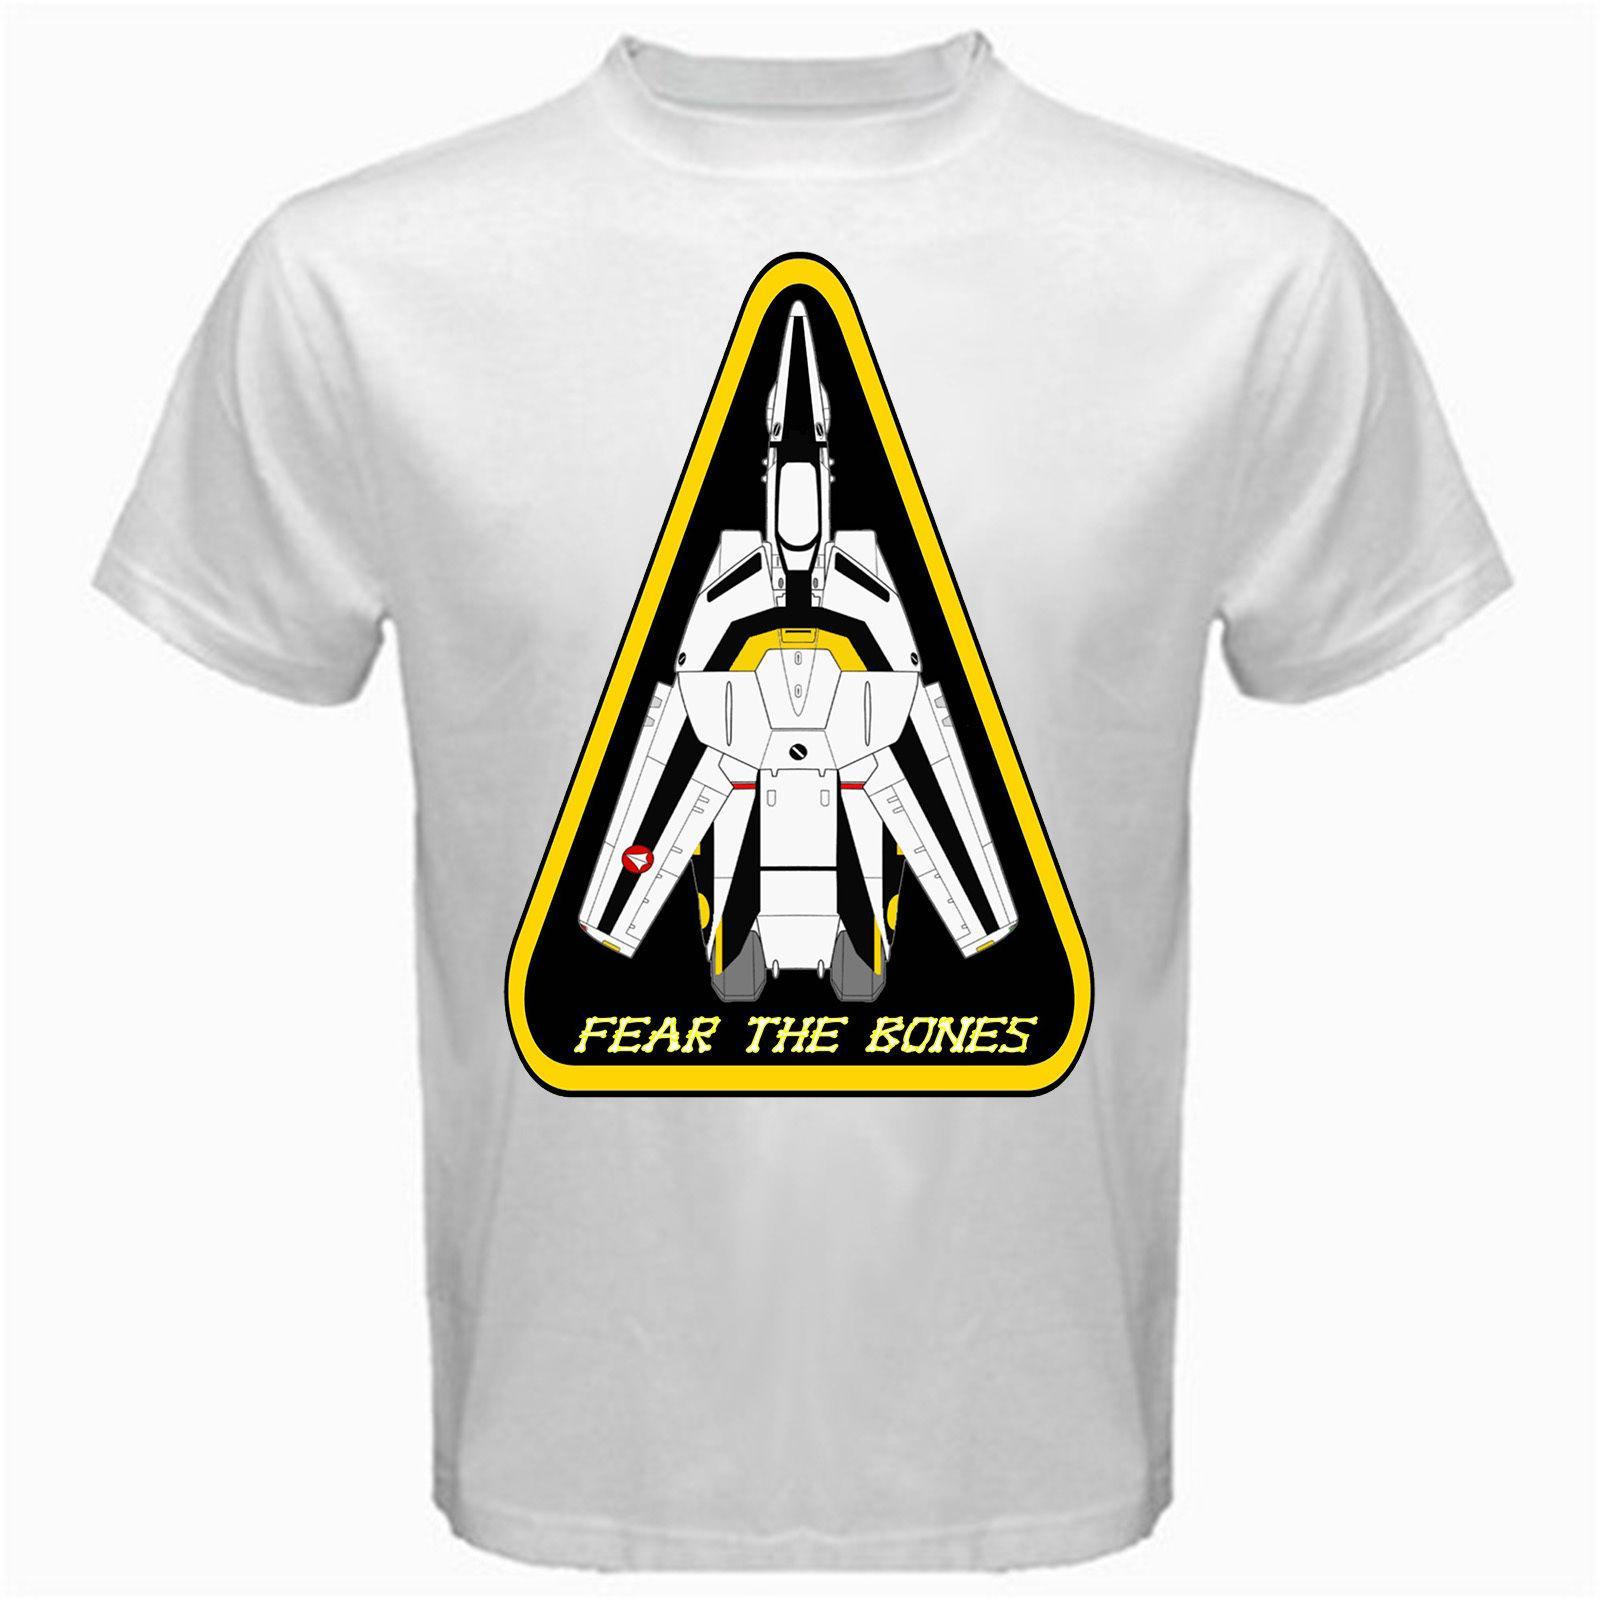 Robotech Macross Fear The Bones Classic Japan Movie T Shirt White Basic Tee  Mens 2018 Fashion Brand T Shirt O Neck 100%cotton T Shirt Tops Funny Slogan  T ... c093badd366